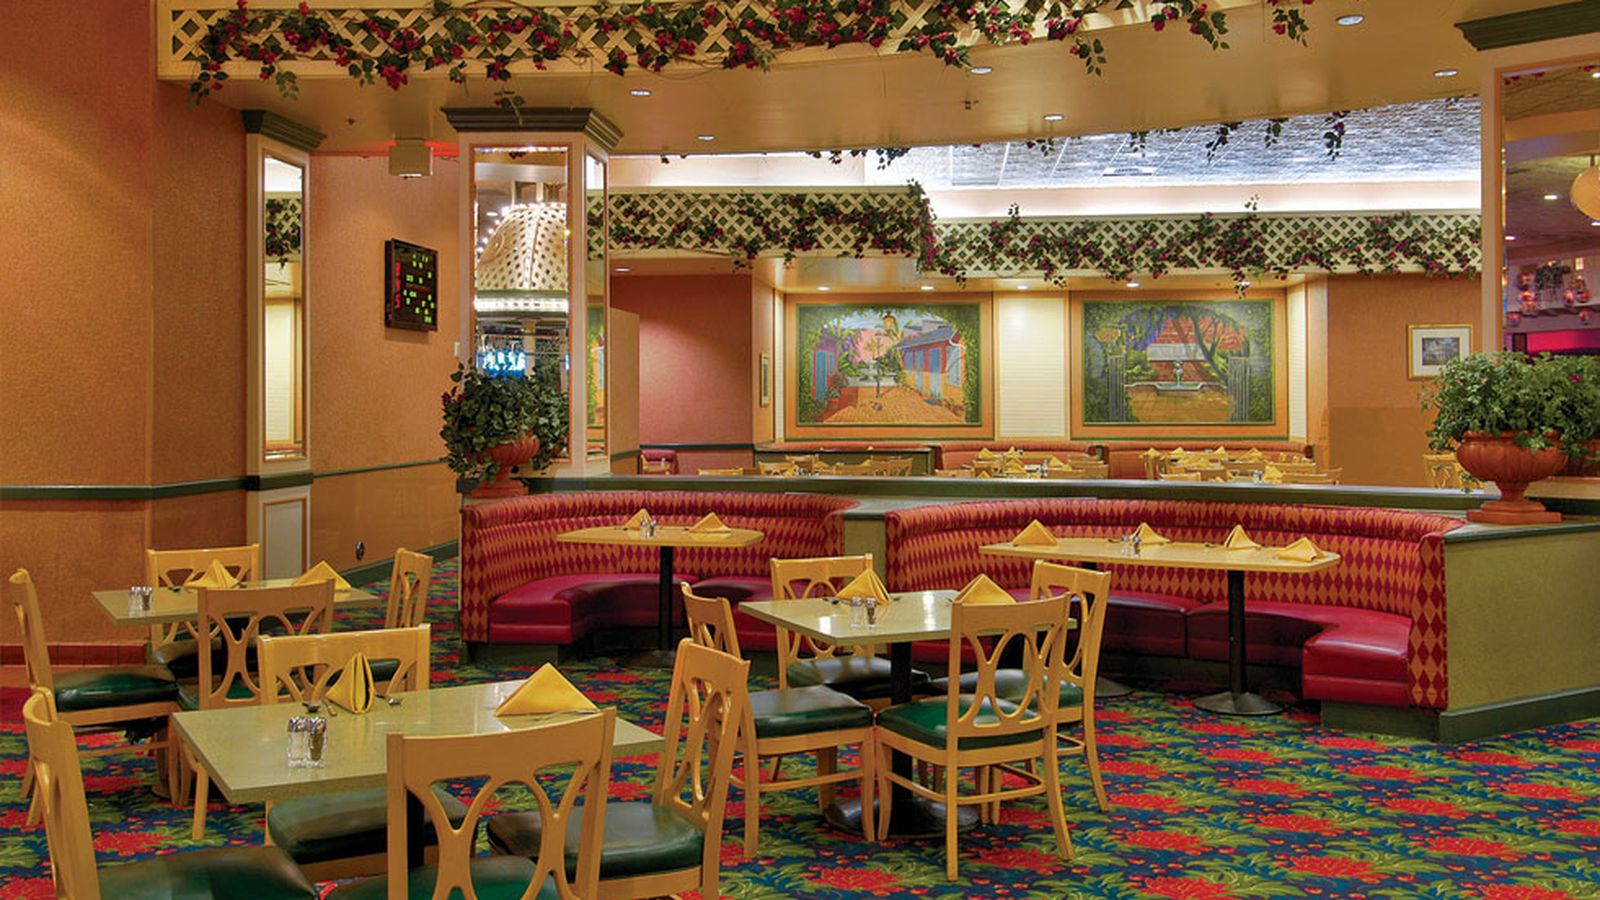 Courtyard Cafe Orleans Menu